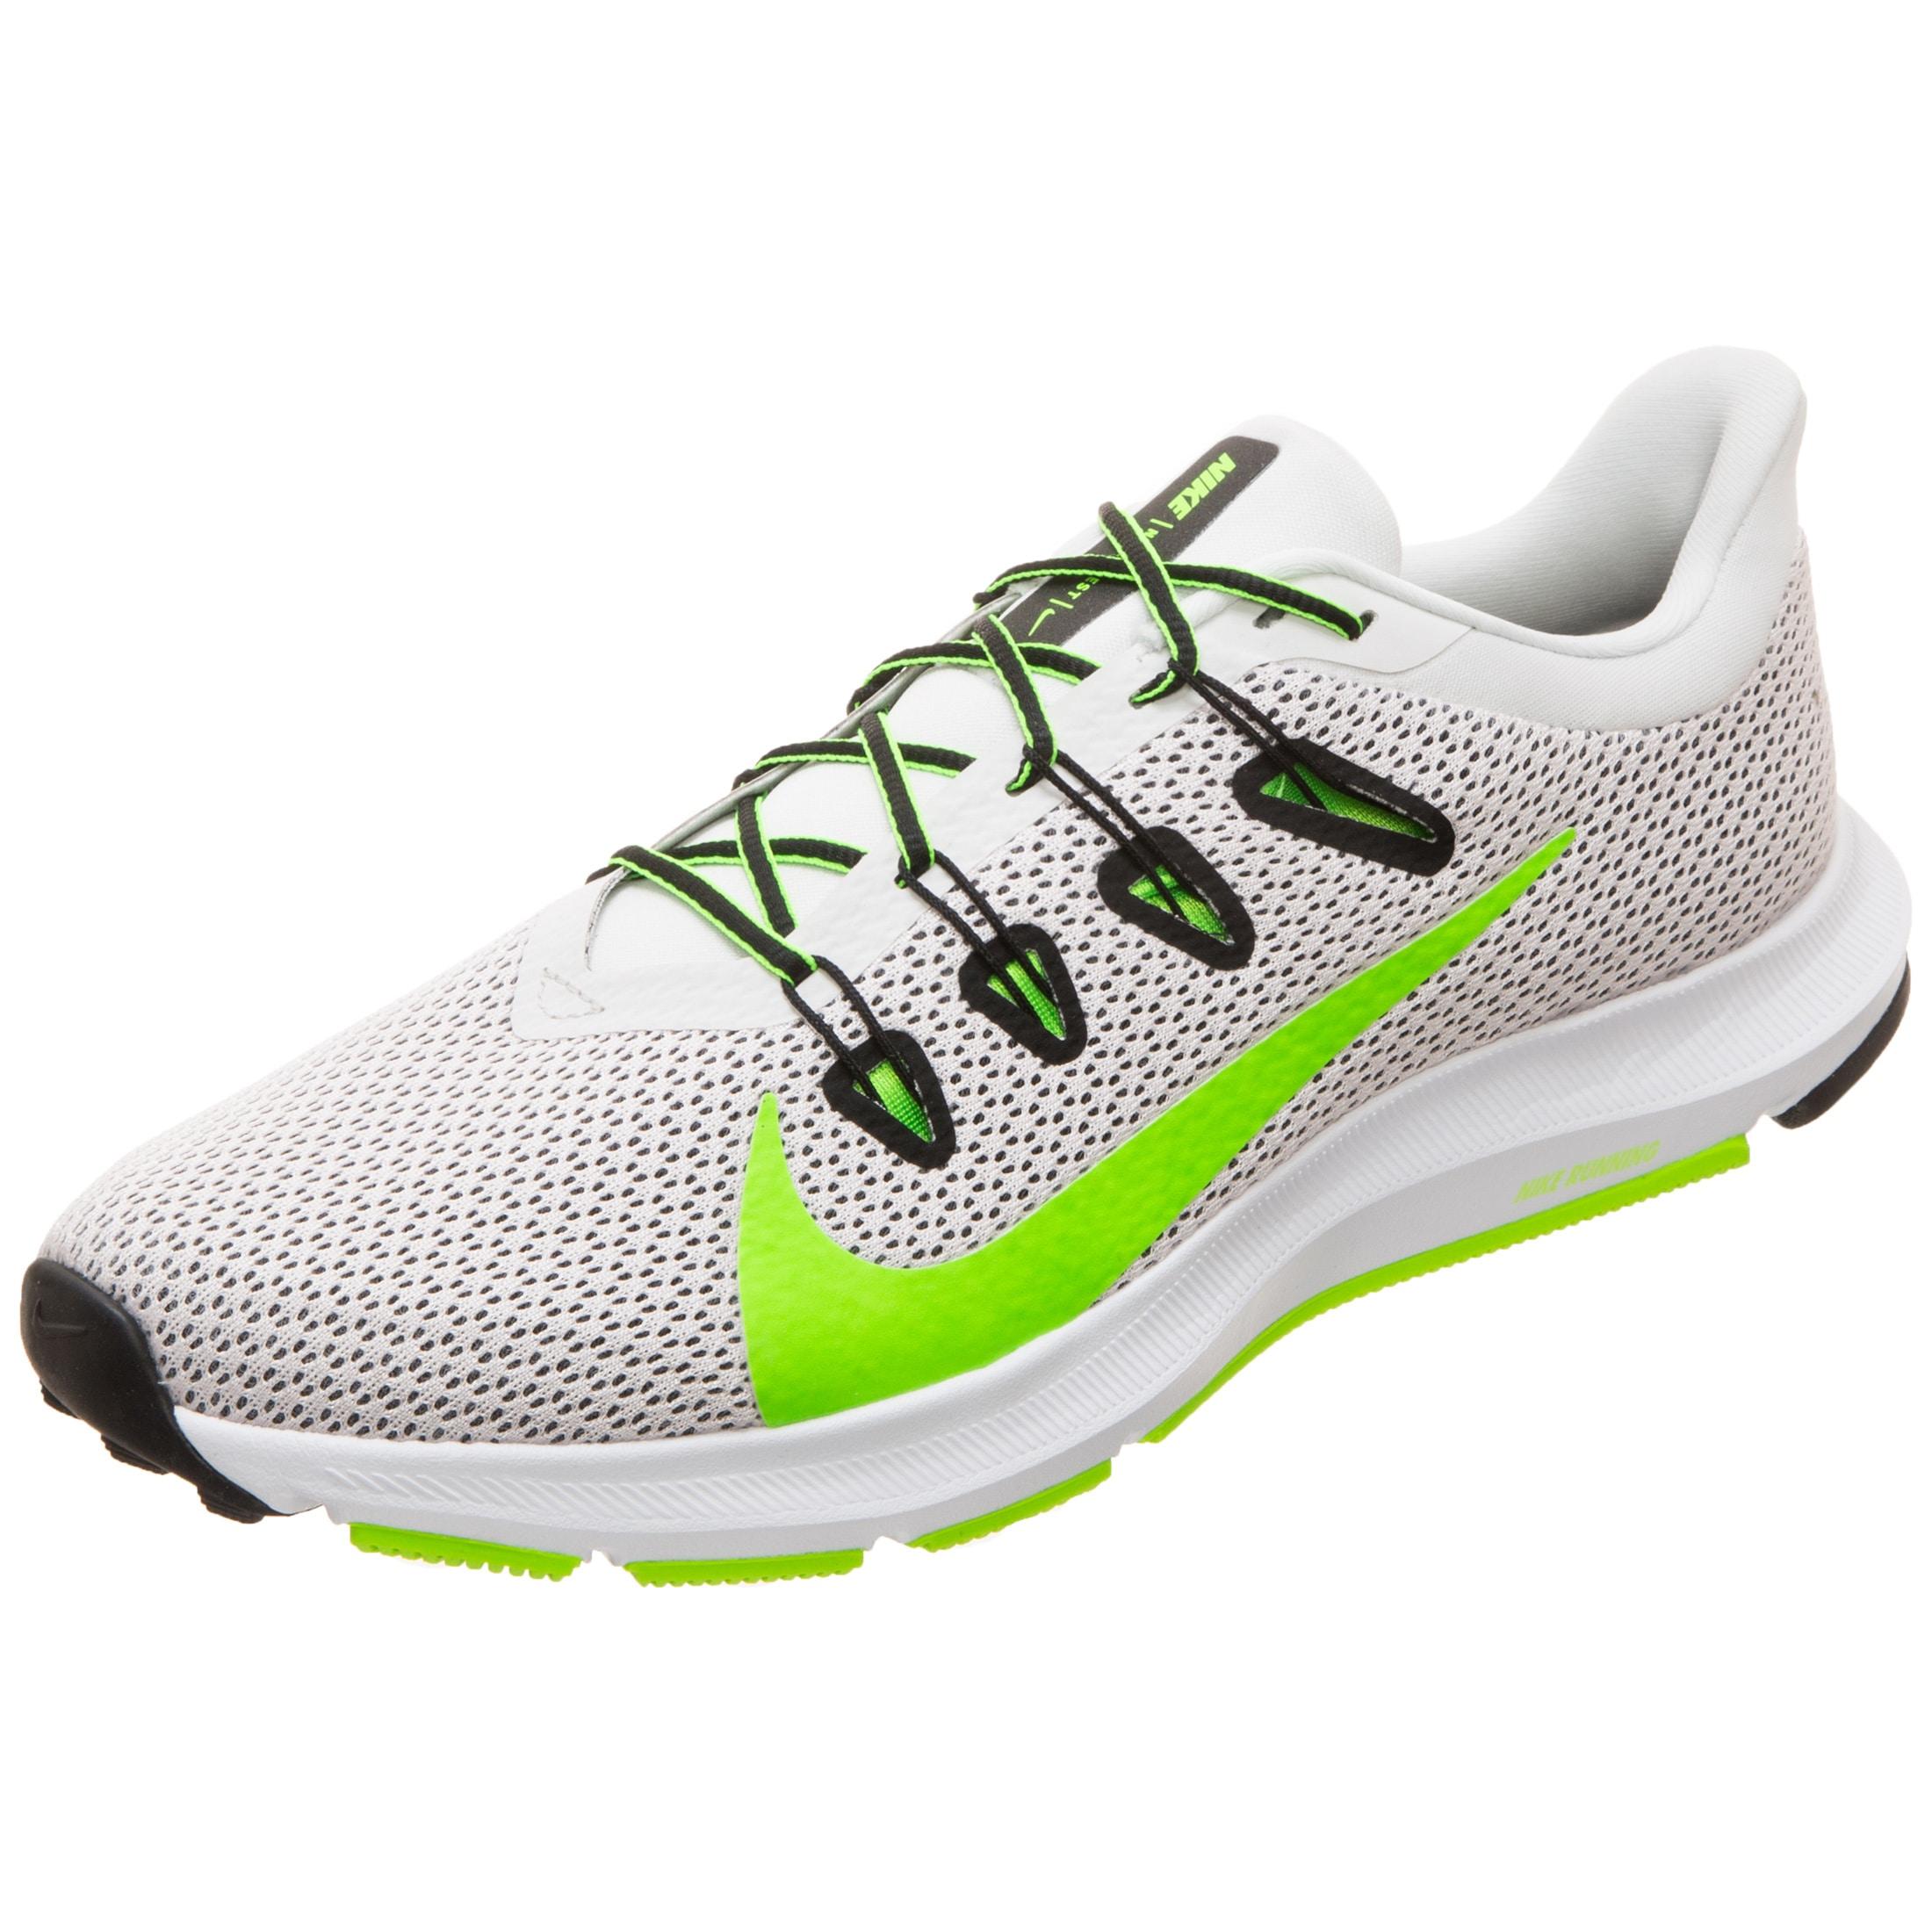 Nike Laufschuh Quest 2 | Schuhe > Sportschuhe | Nike